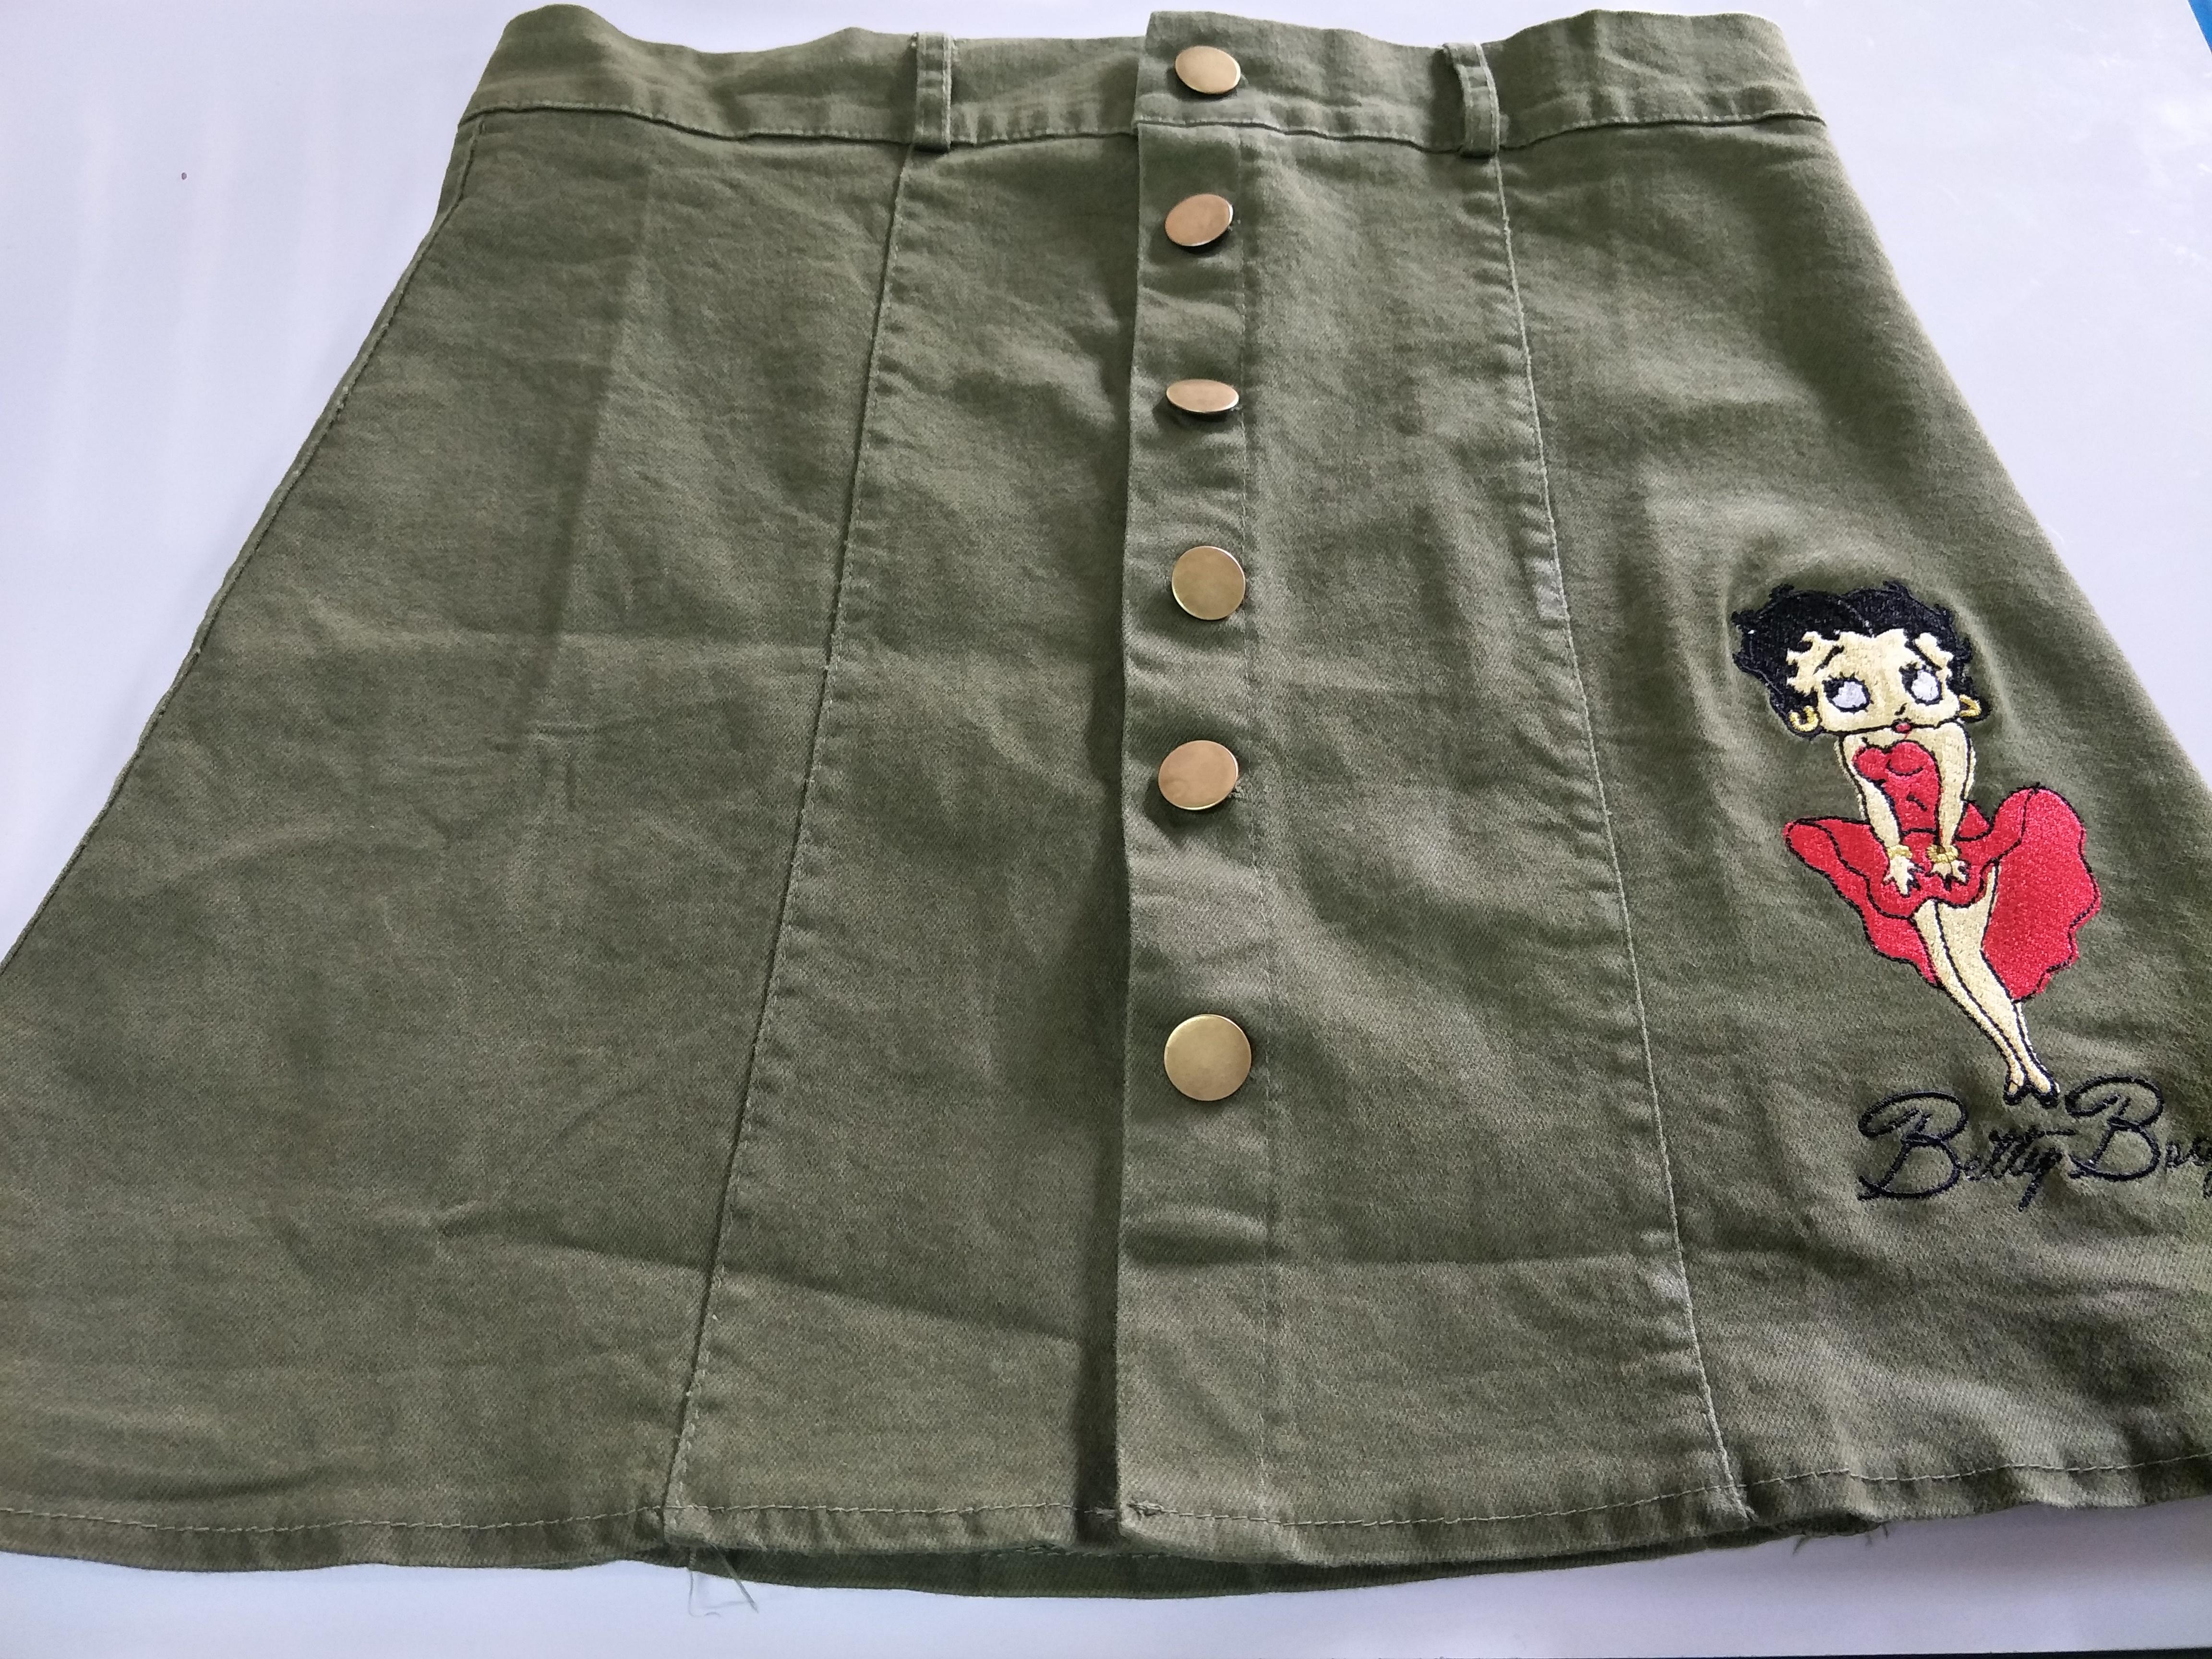 SJ0001กระโปรงยีนส๋เอวสูง mini skirt ปักลาย Betty Boop